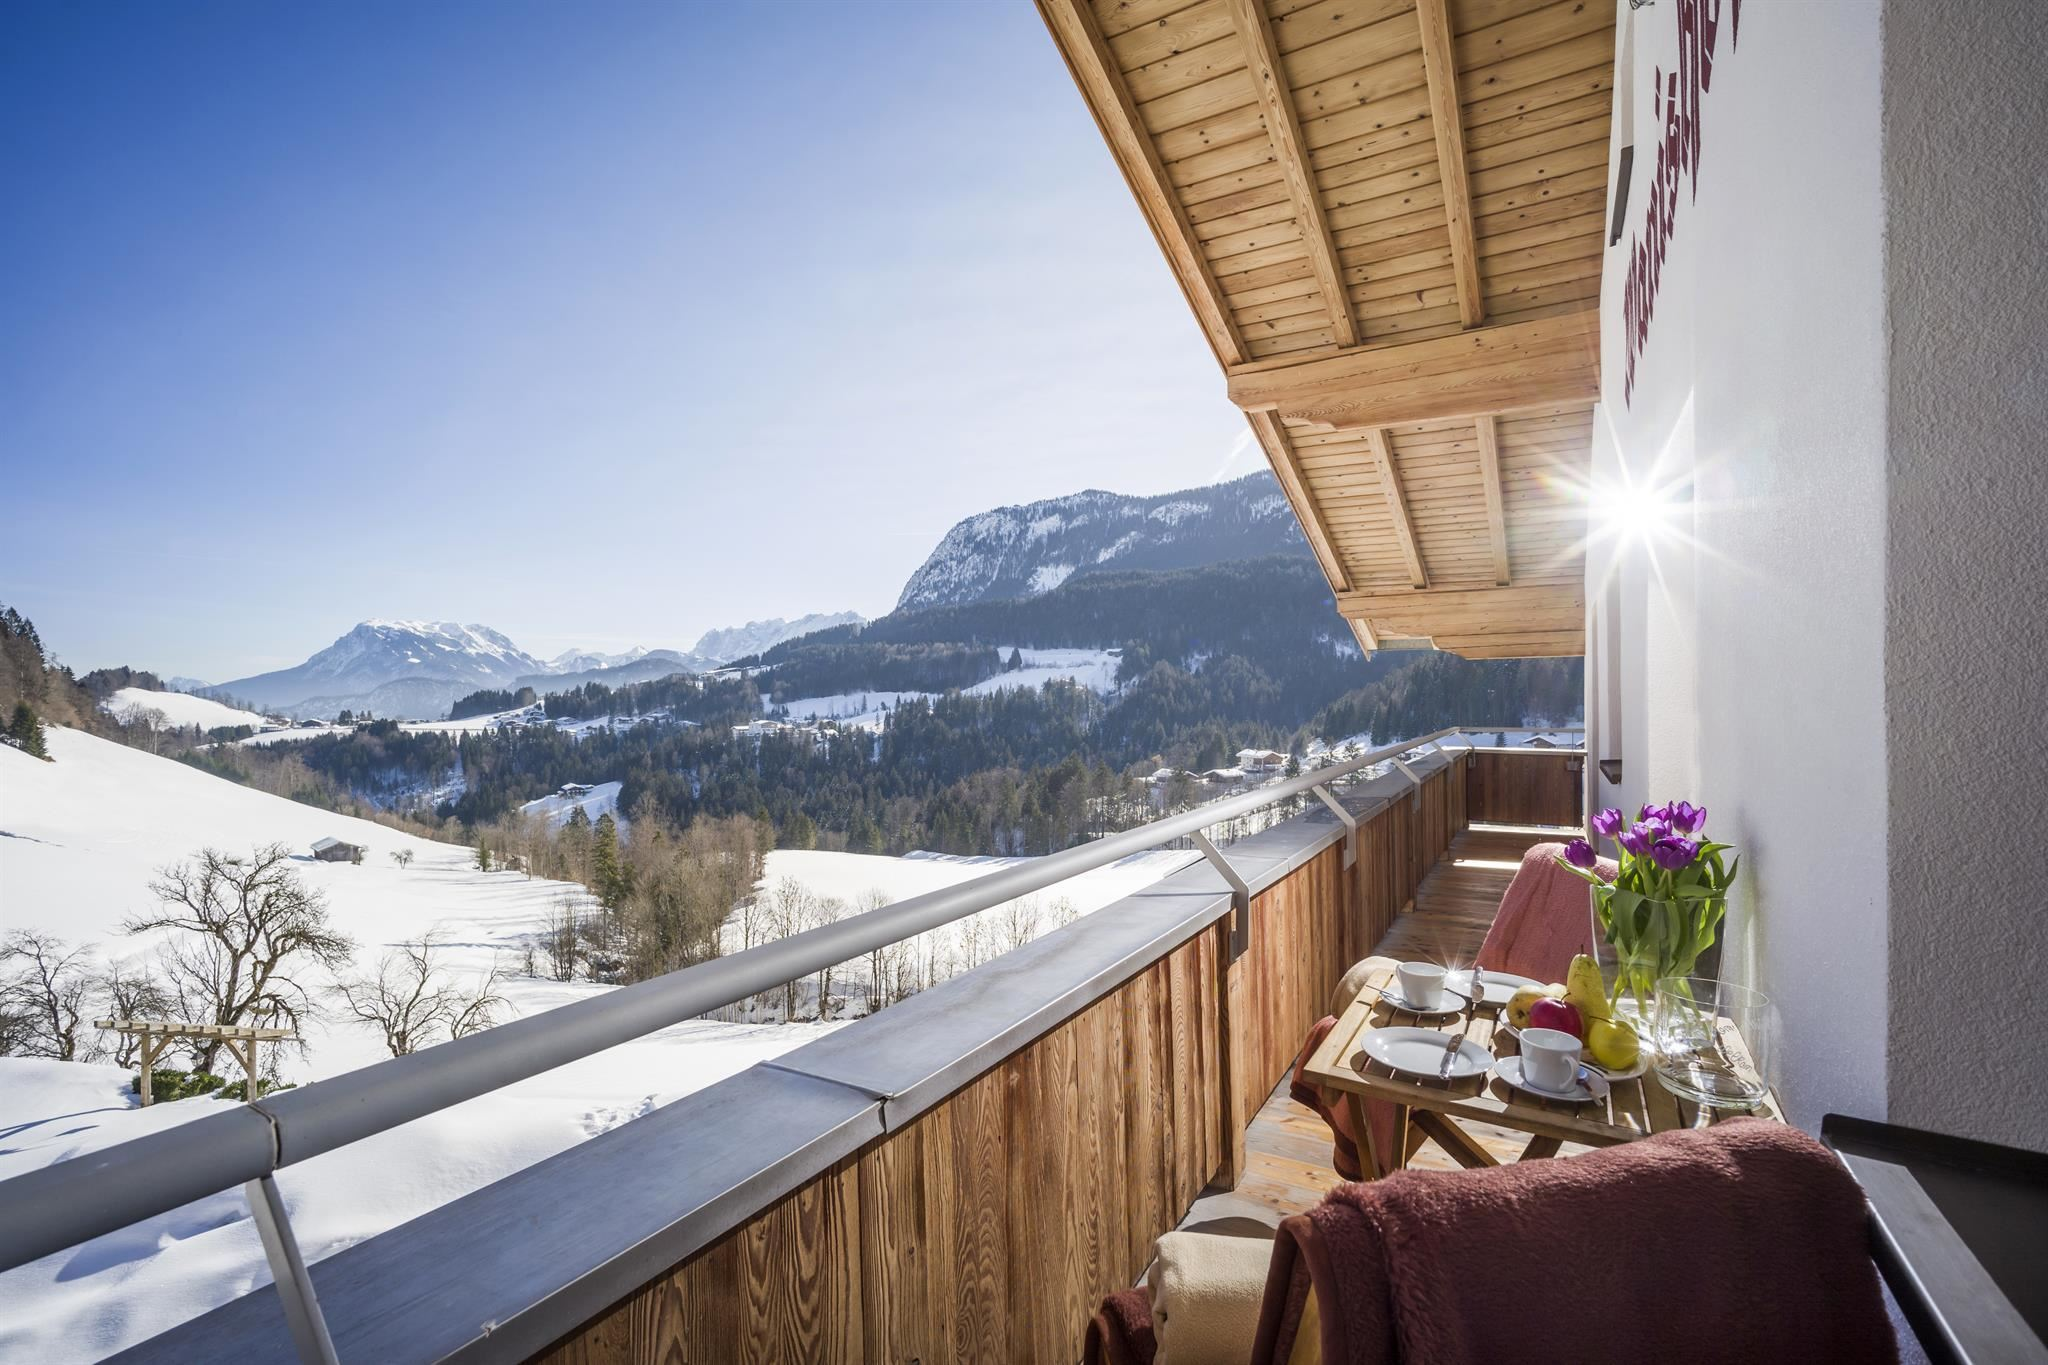 Tirolina - Ski-, Sport- & Aktivberg Thiersee/Bad - BERGFEX